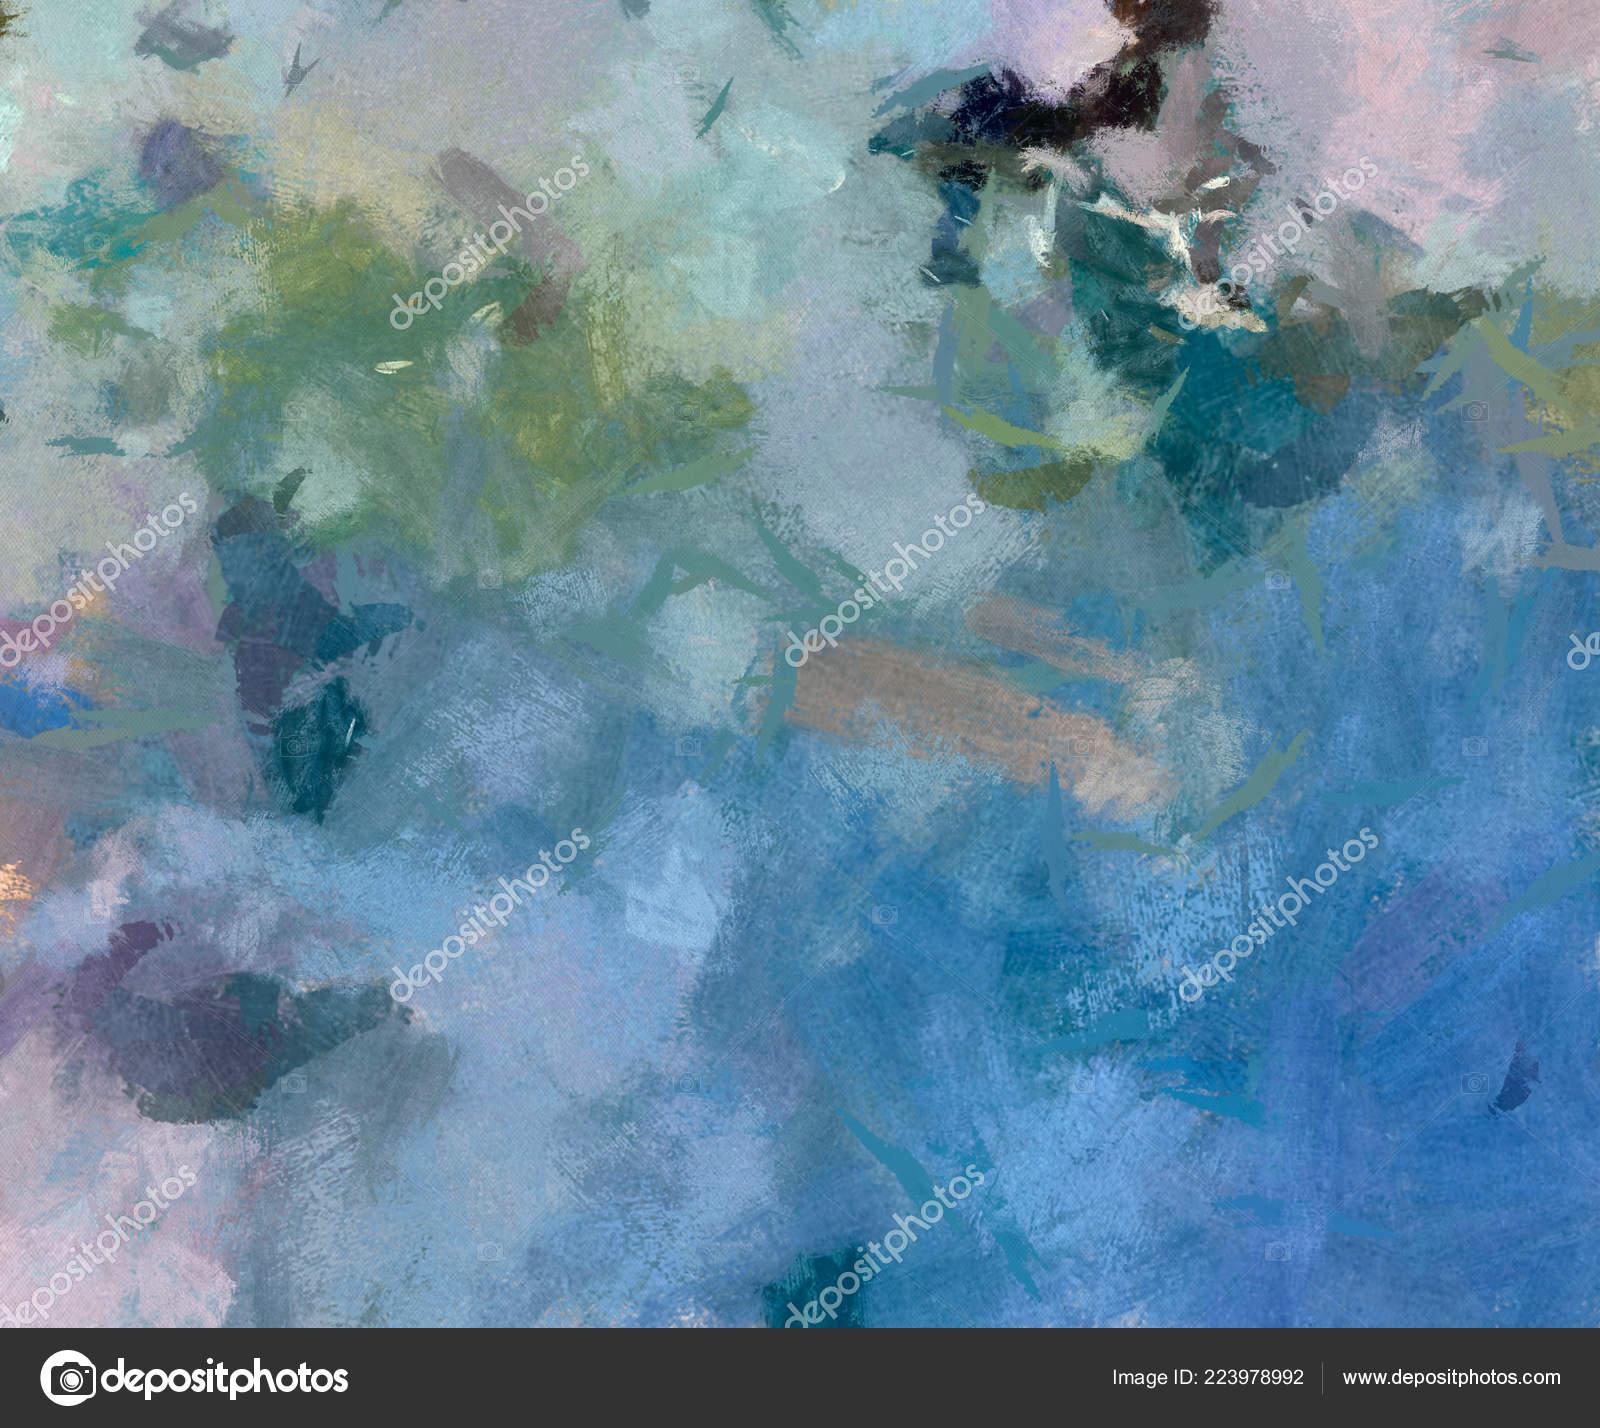 0bb2733120 Ψηφιακή τέχνη αφηρημένη φαντασία. Χέρι σχεδίασης μοντέρνα τέχνη εκτύπωσης.  Φουτουριστικό έργα τέχνης. Σύγχρονη ζωγραφική διακόσμηση τοίχου. Λάδι σε  καμβά.